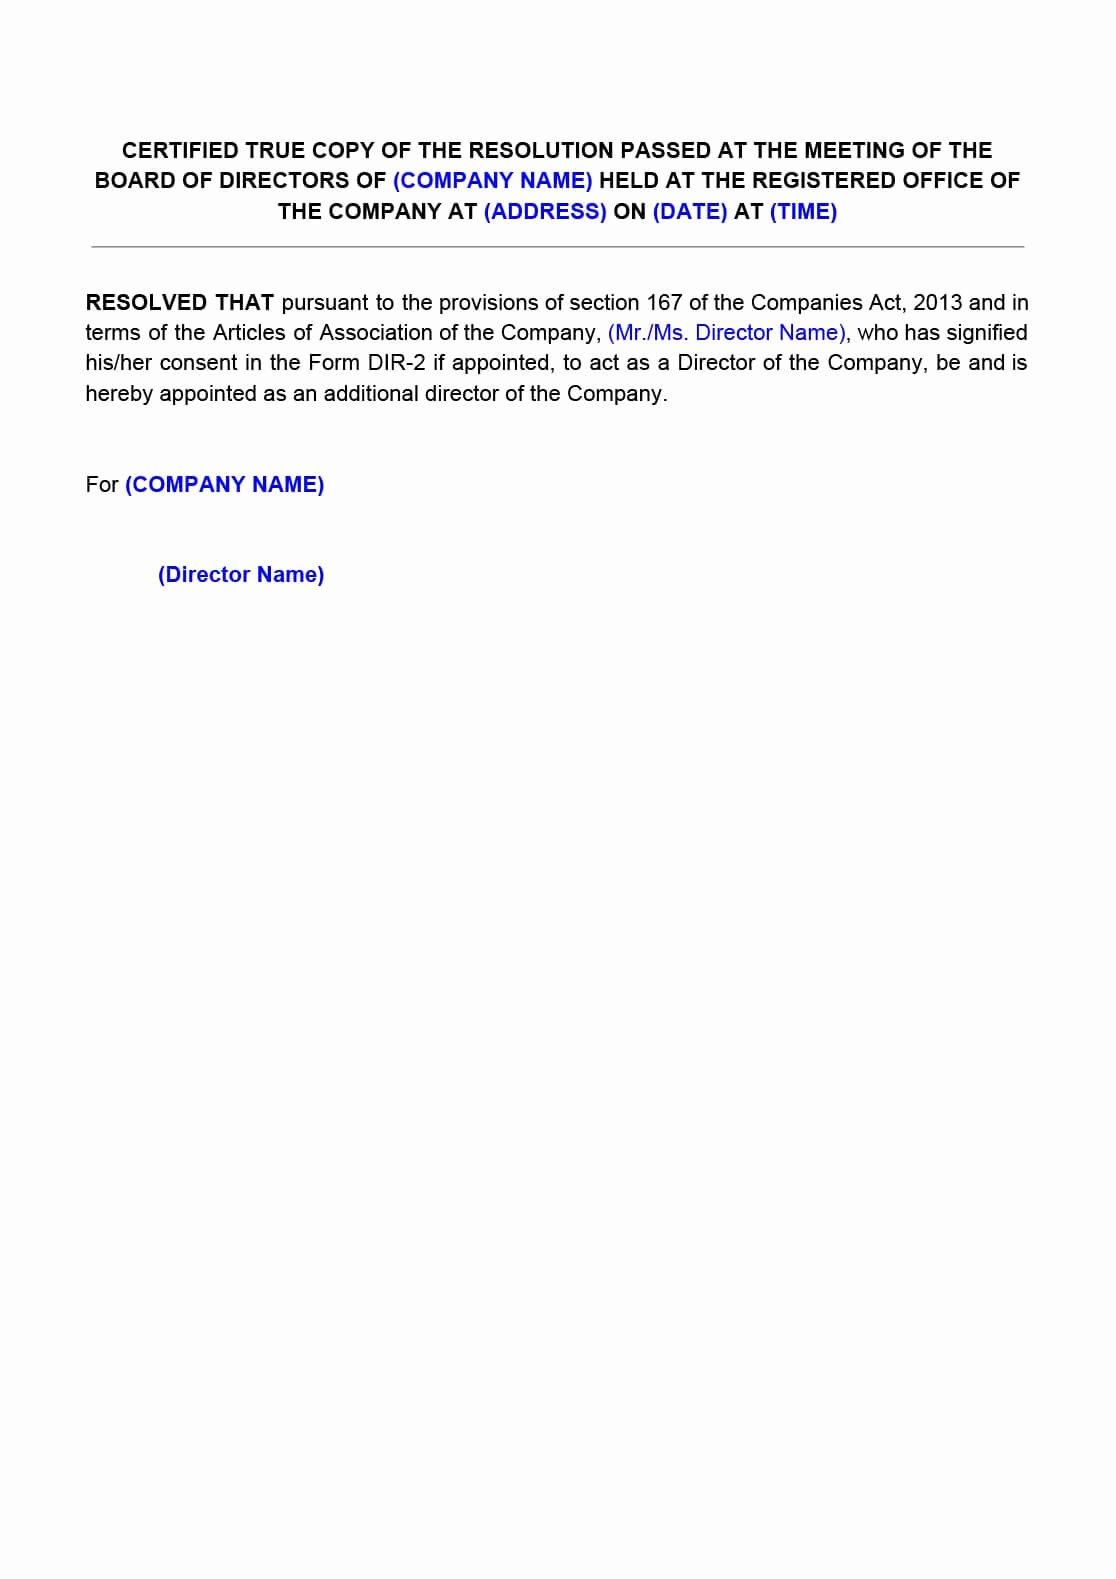 Board Of Directors Resolution Template Beautiful Board Resolution for Appointment Of Director